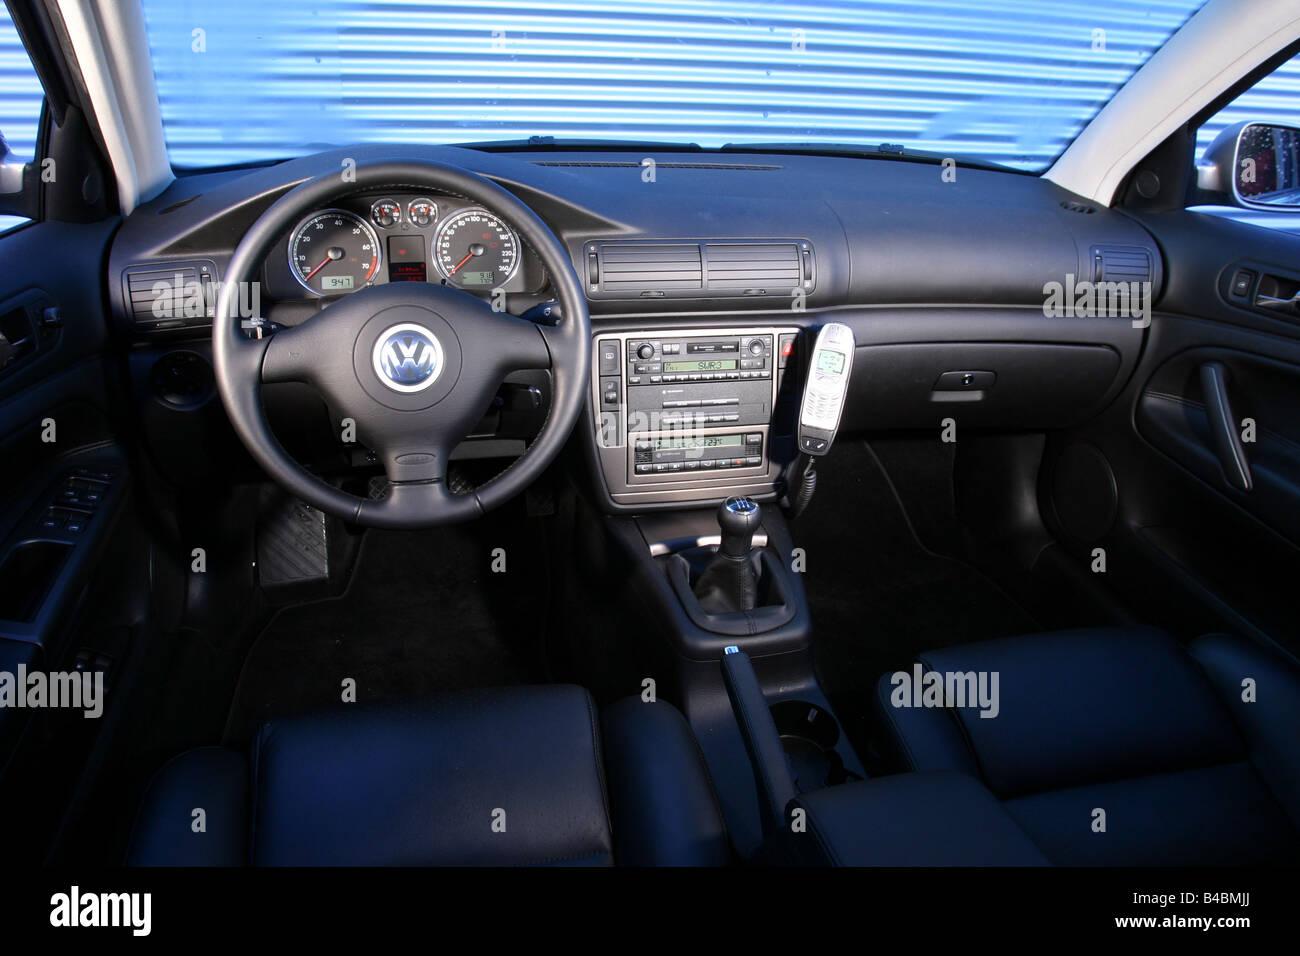 VW vw passat 2001 : Car, VW Volkswagen Passat Variant 1.8 T, medium class, model year ...